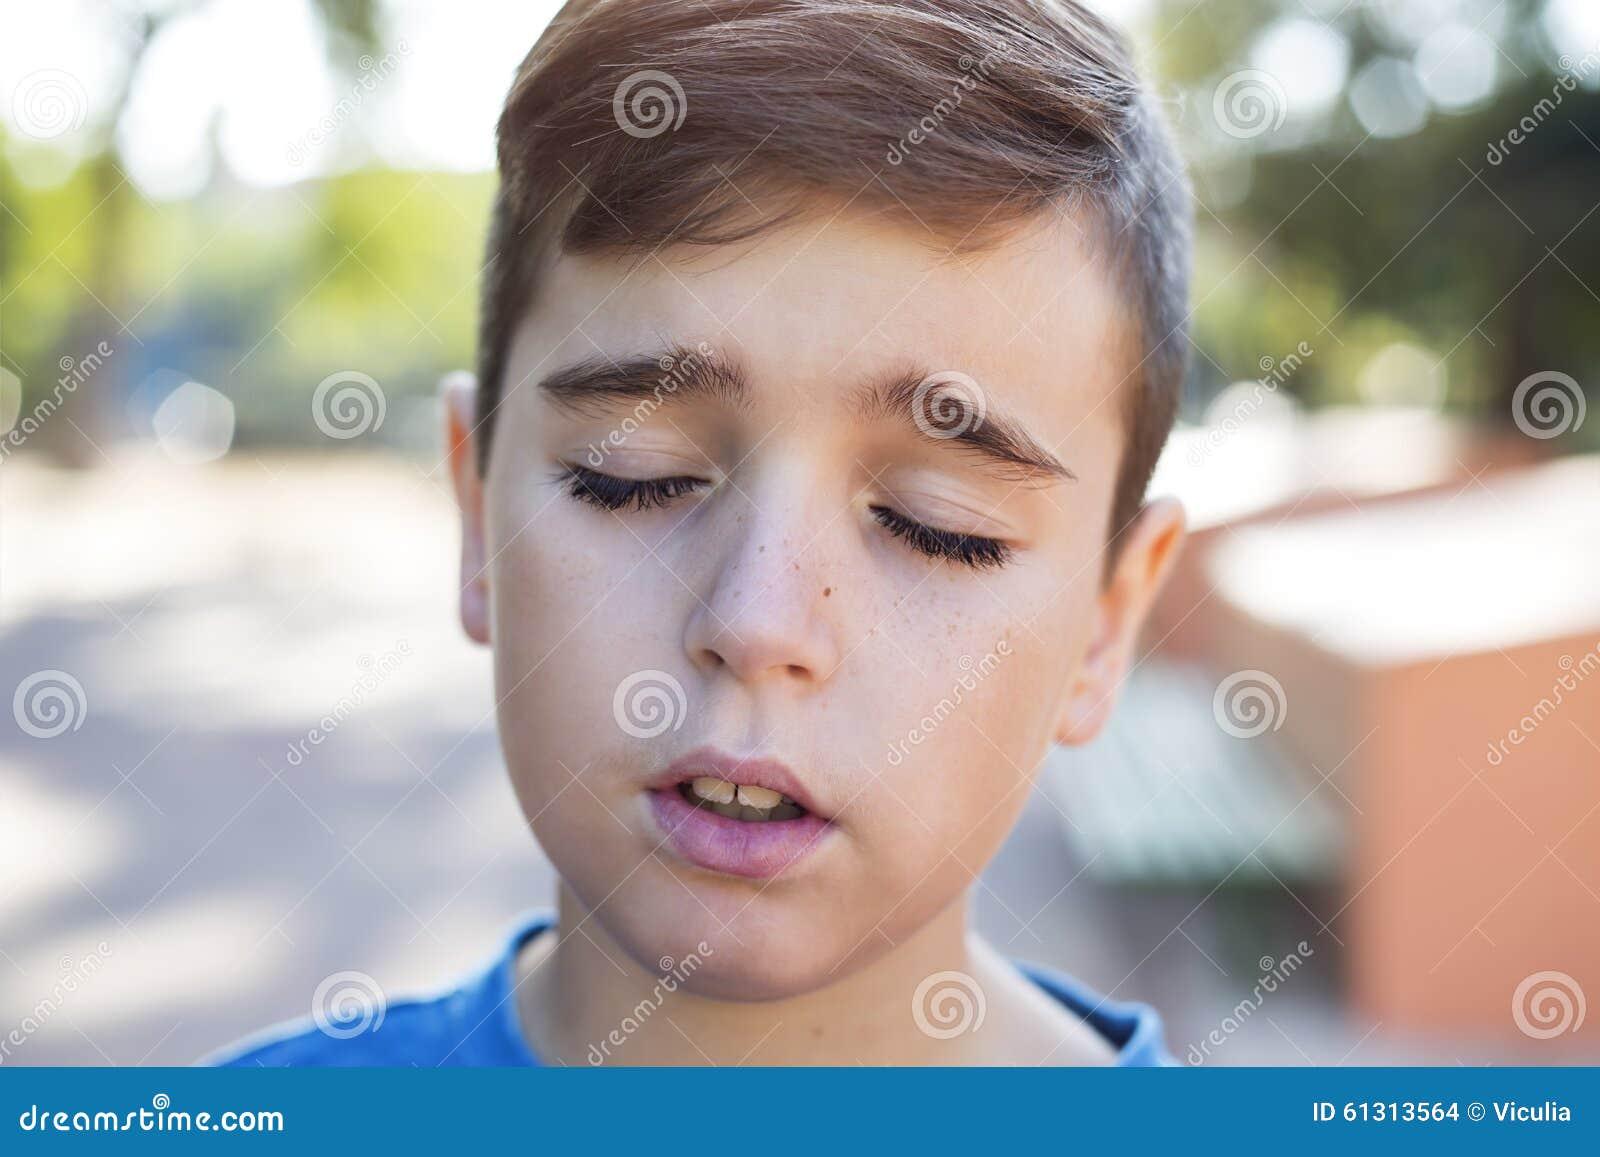 Close up portrait of a handsome boy